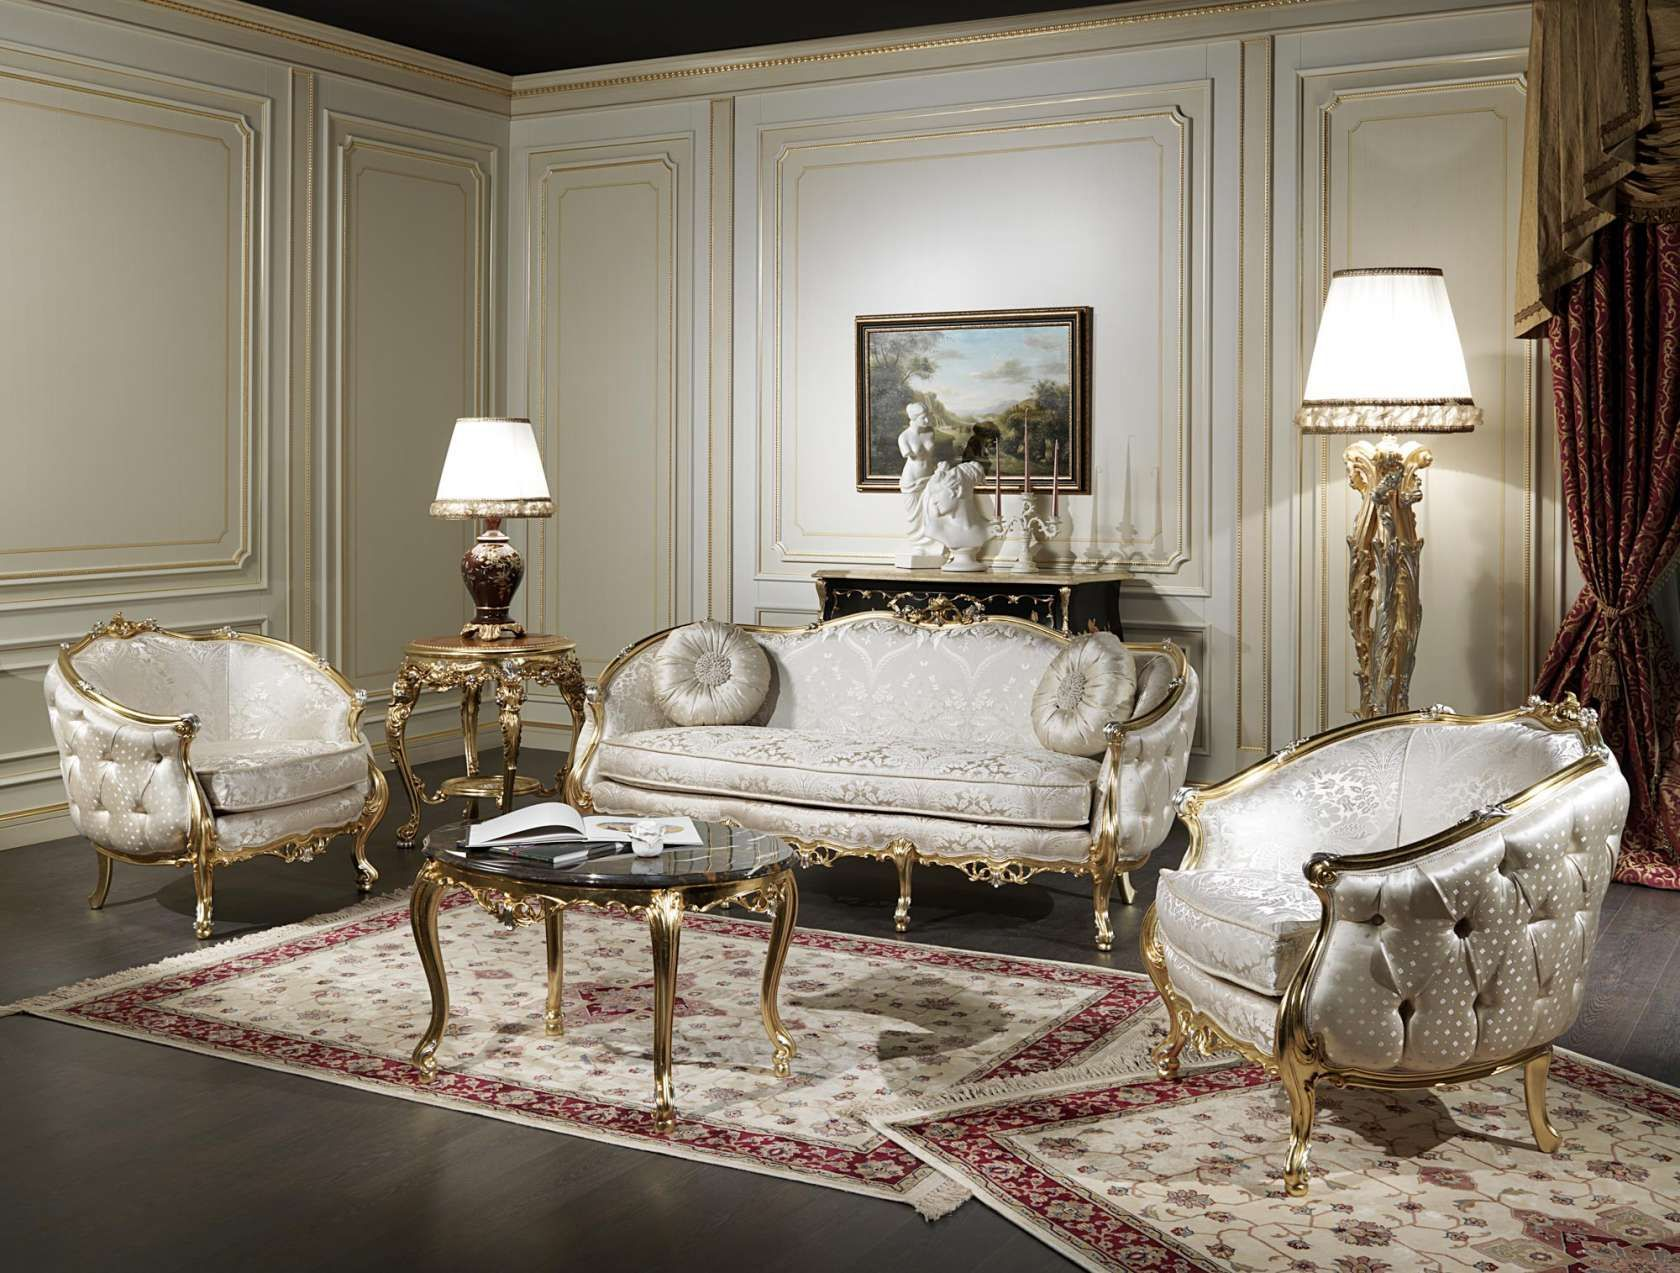 Classic Living Room Chairs How To Decor Venezia Luxury Future Home